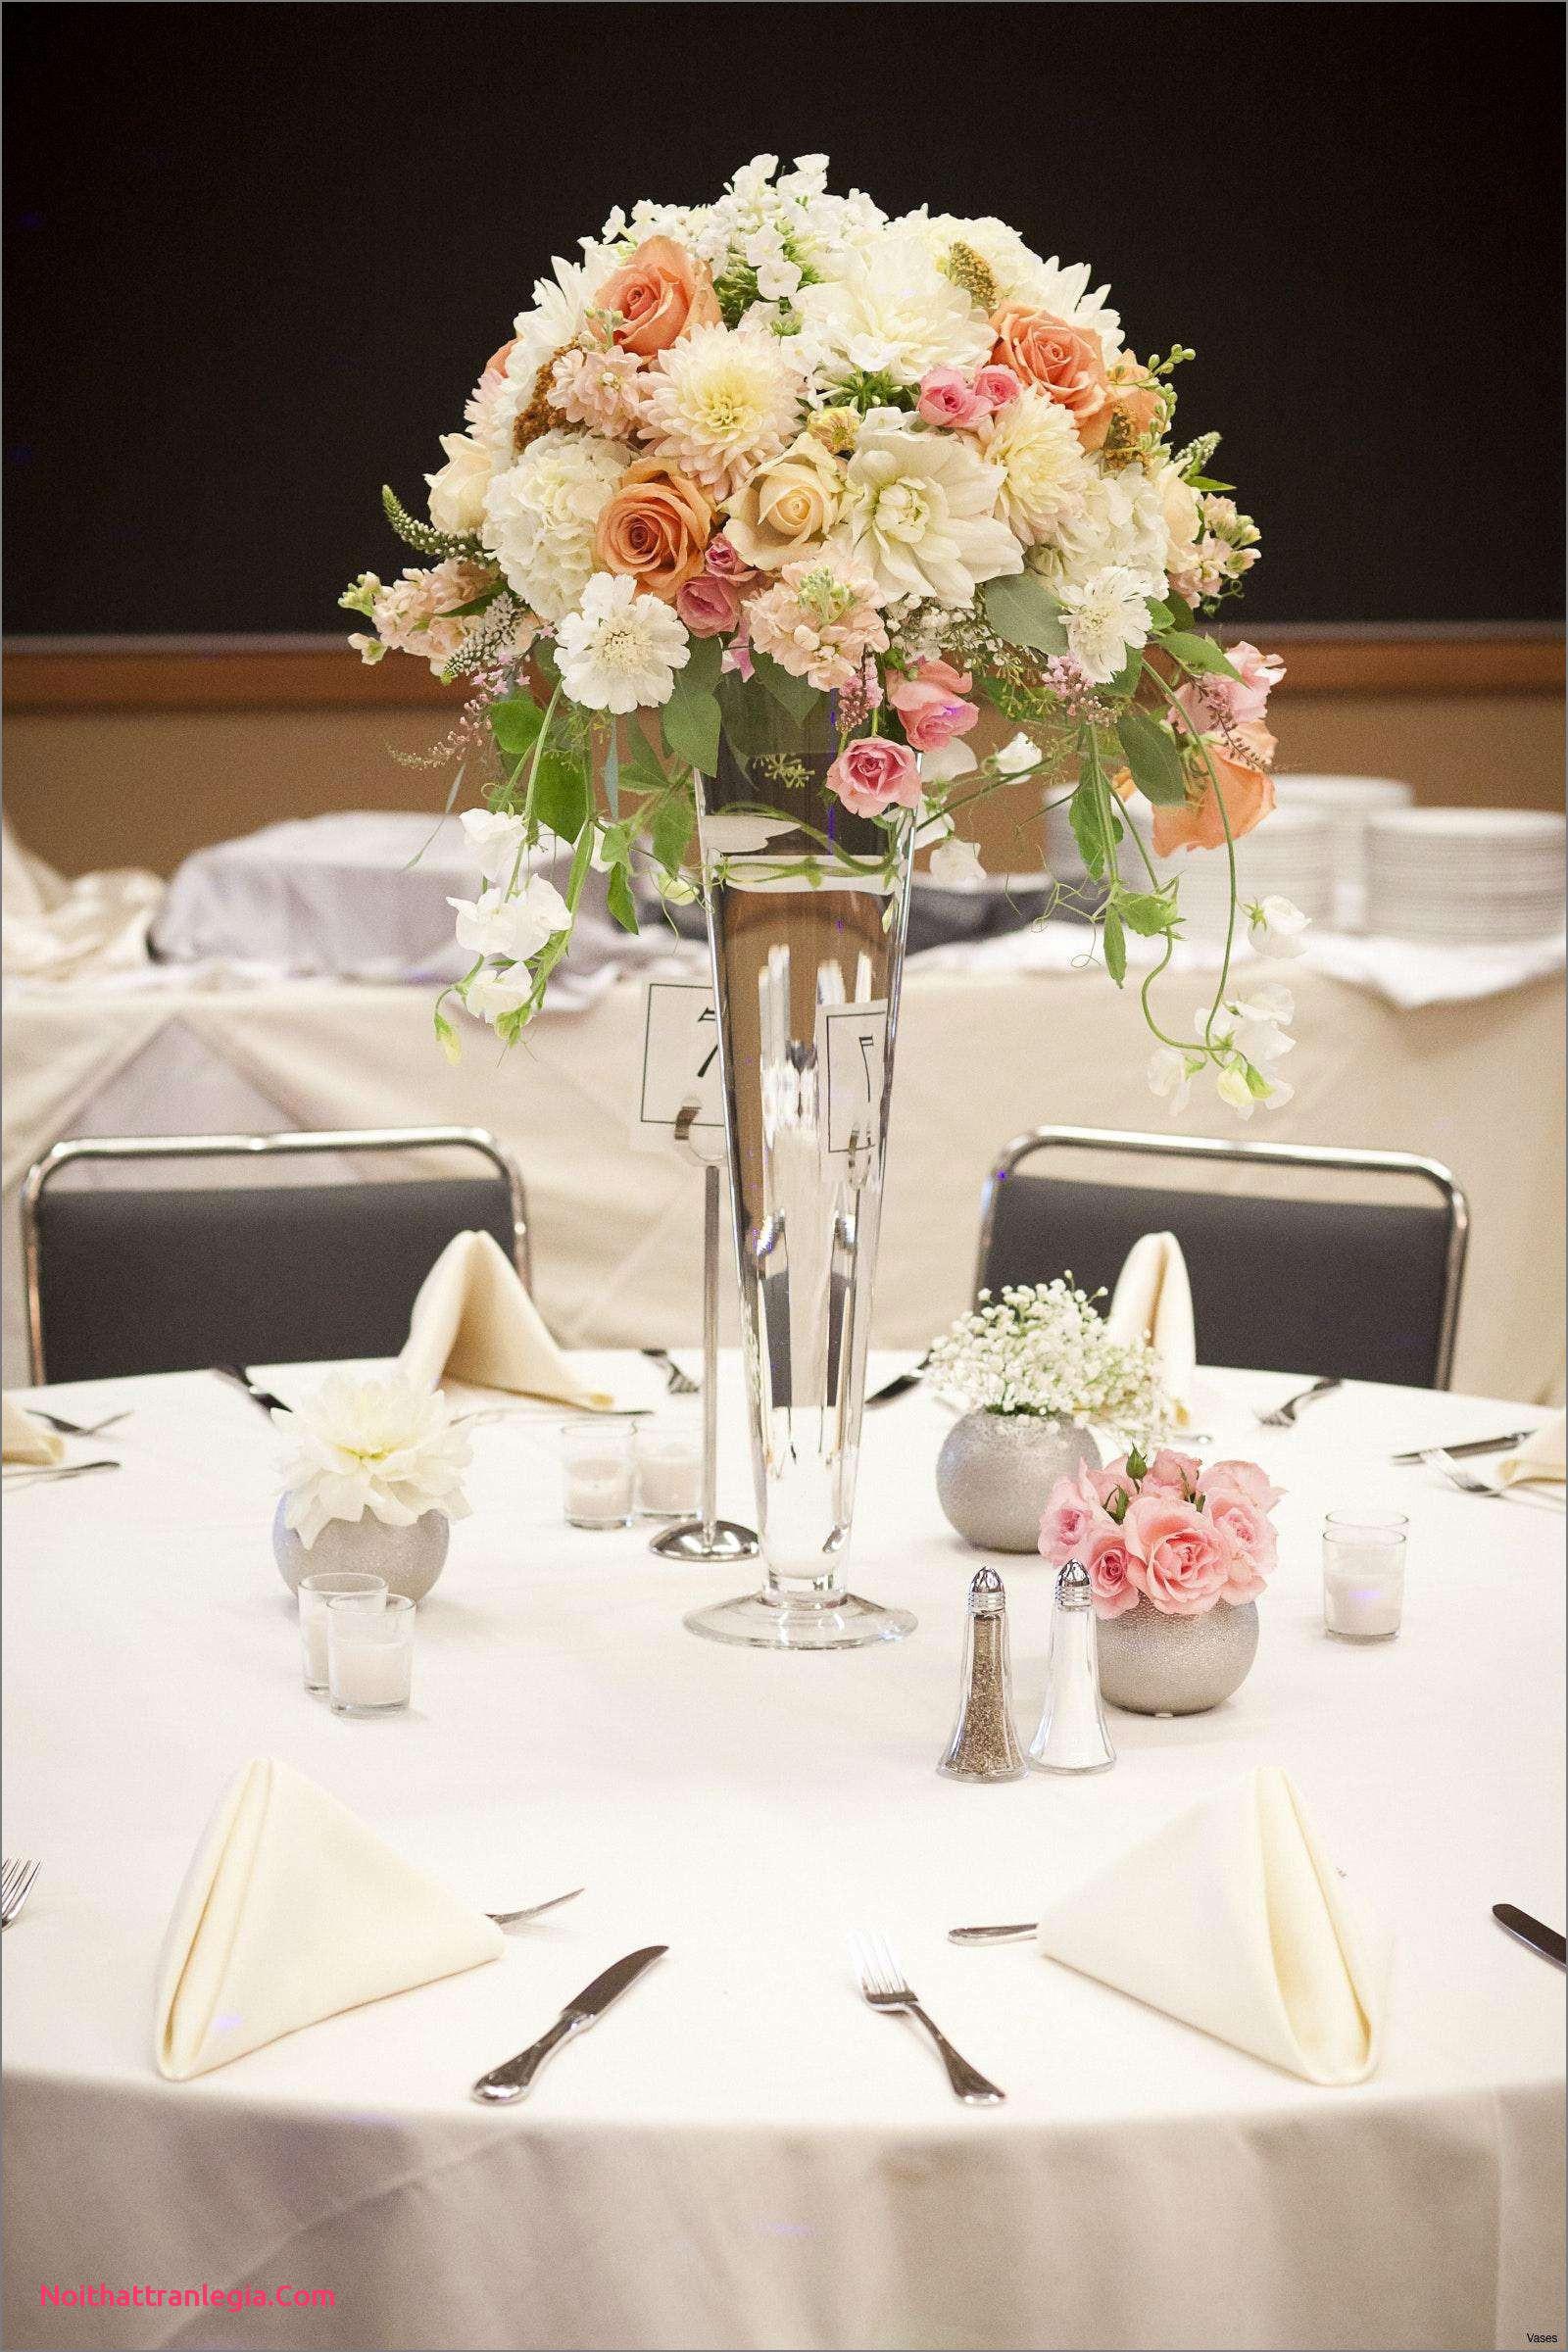 Square Black Glass Vase Of 20 Wedding Vases Noithattranlegia Vases Design Inside Living Room Vases Wedding Inspirational H Vases Candy Vase I 0d